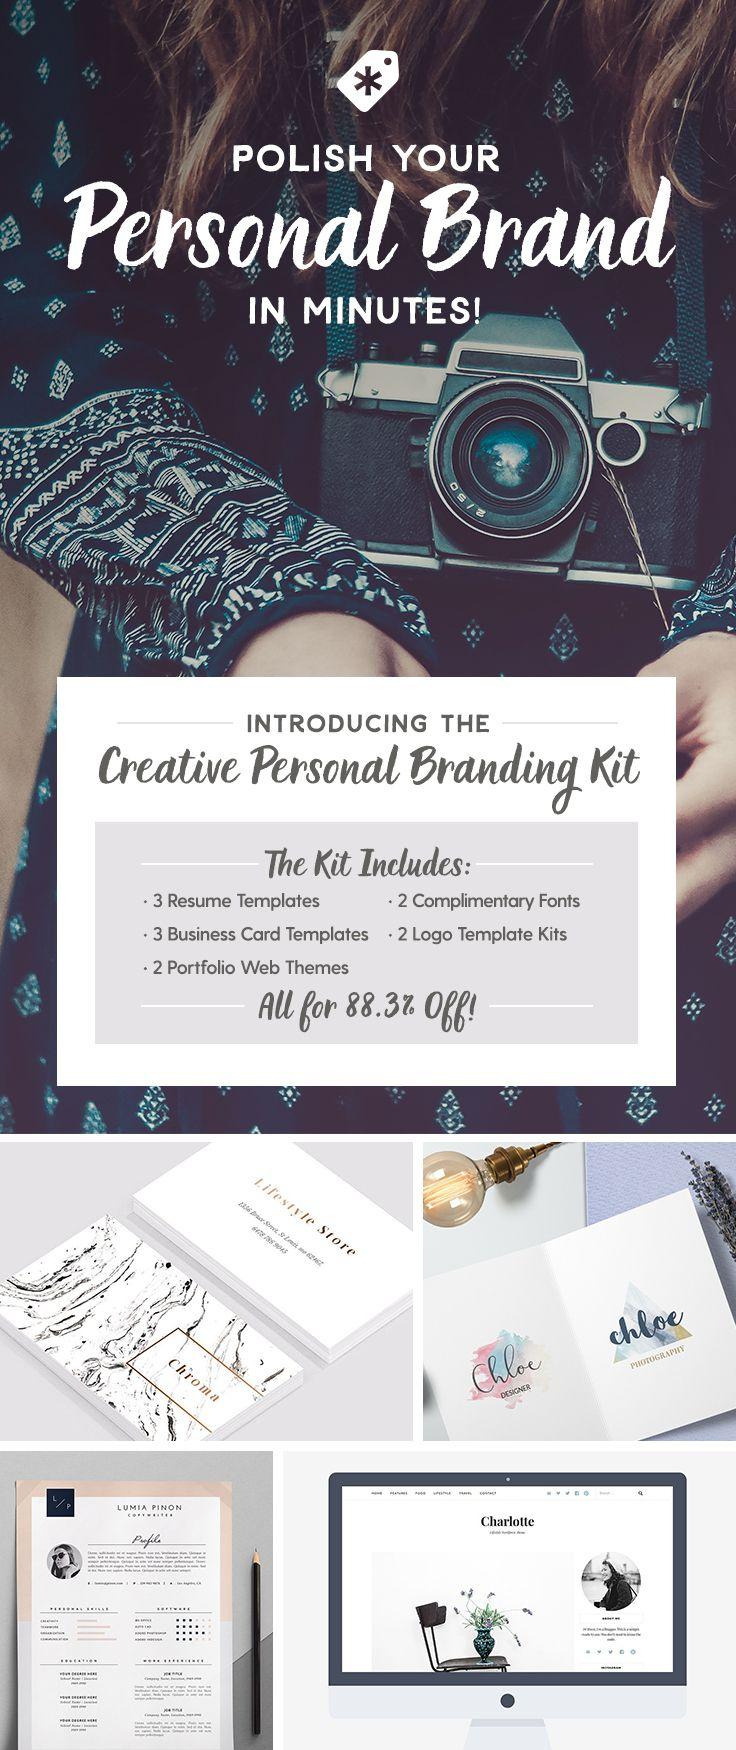 Mejores 88 imágenes de ✏ All Things Branding en Pinterest | Estilo ...